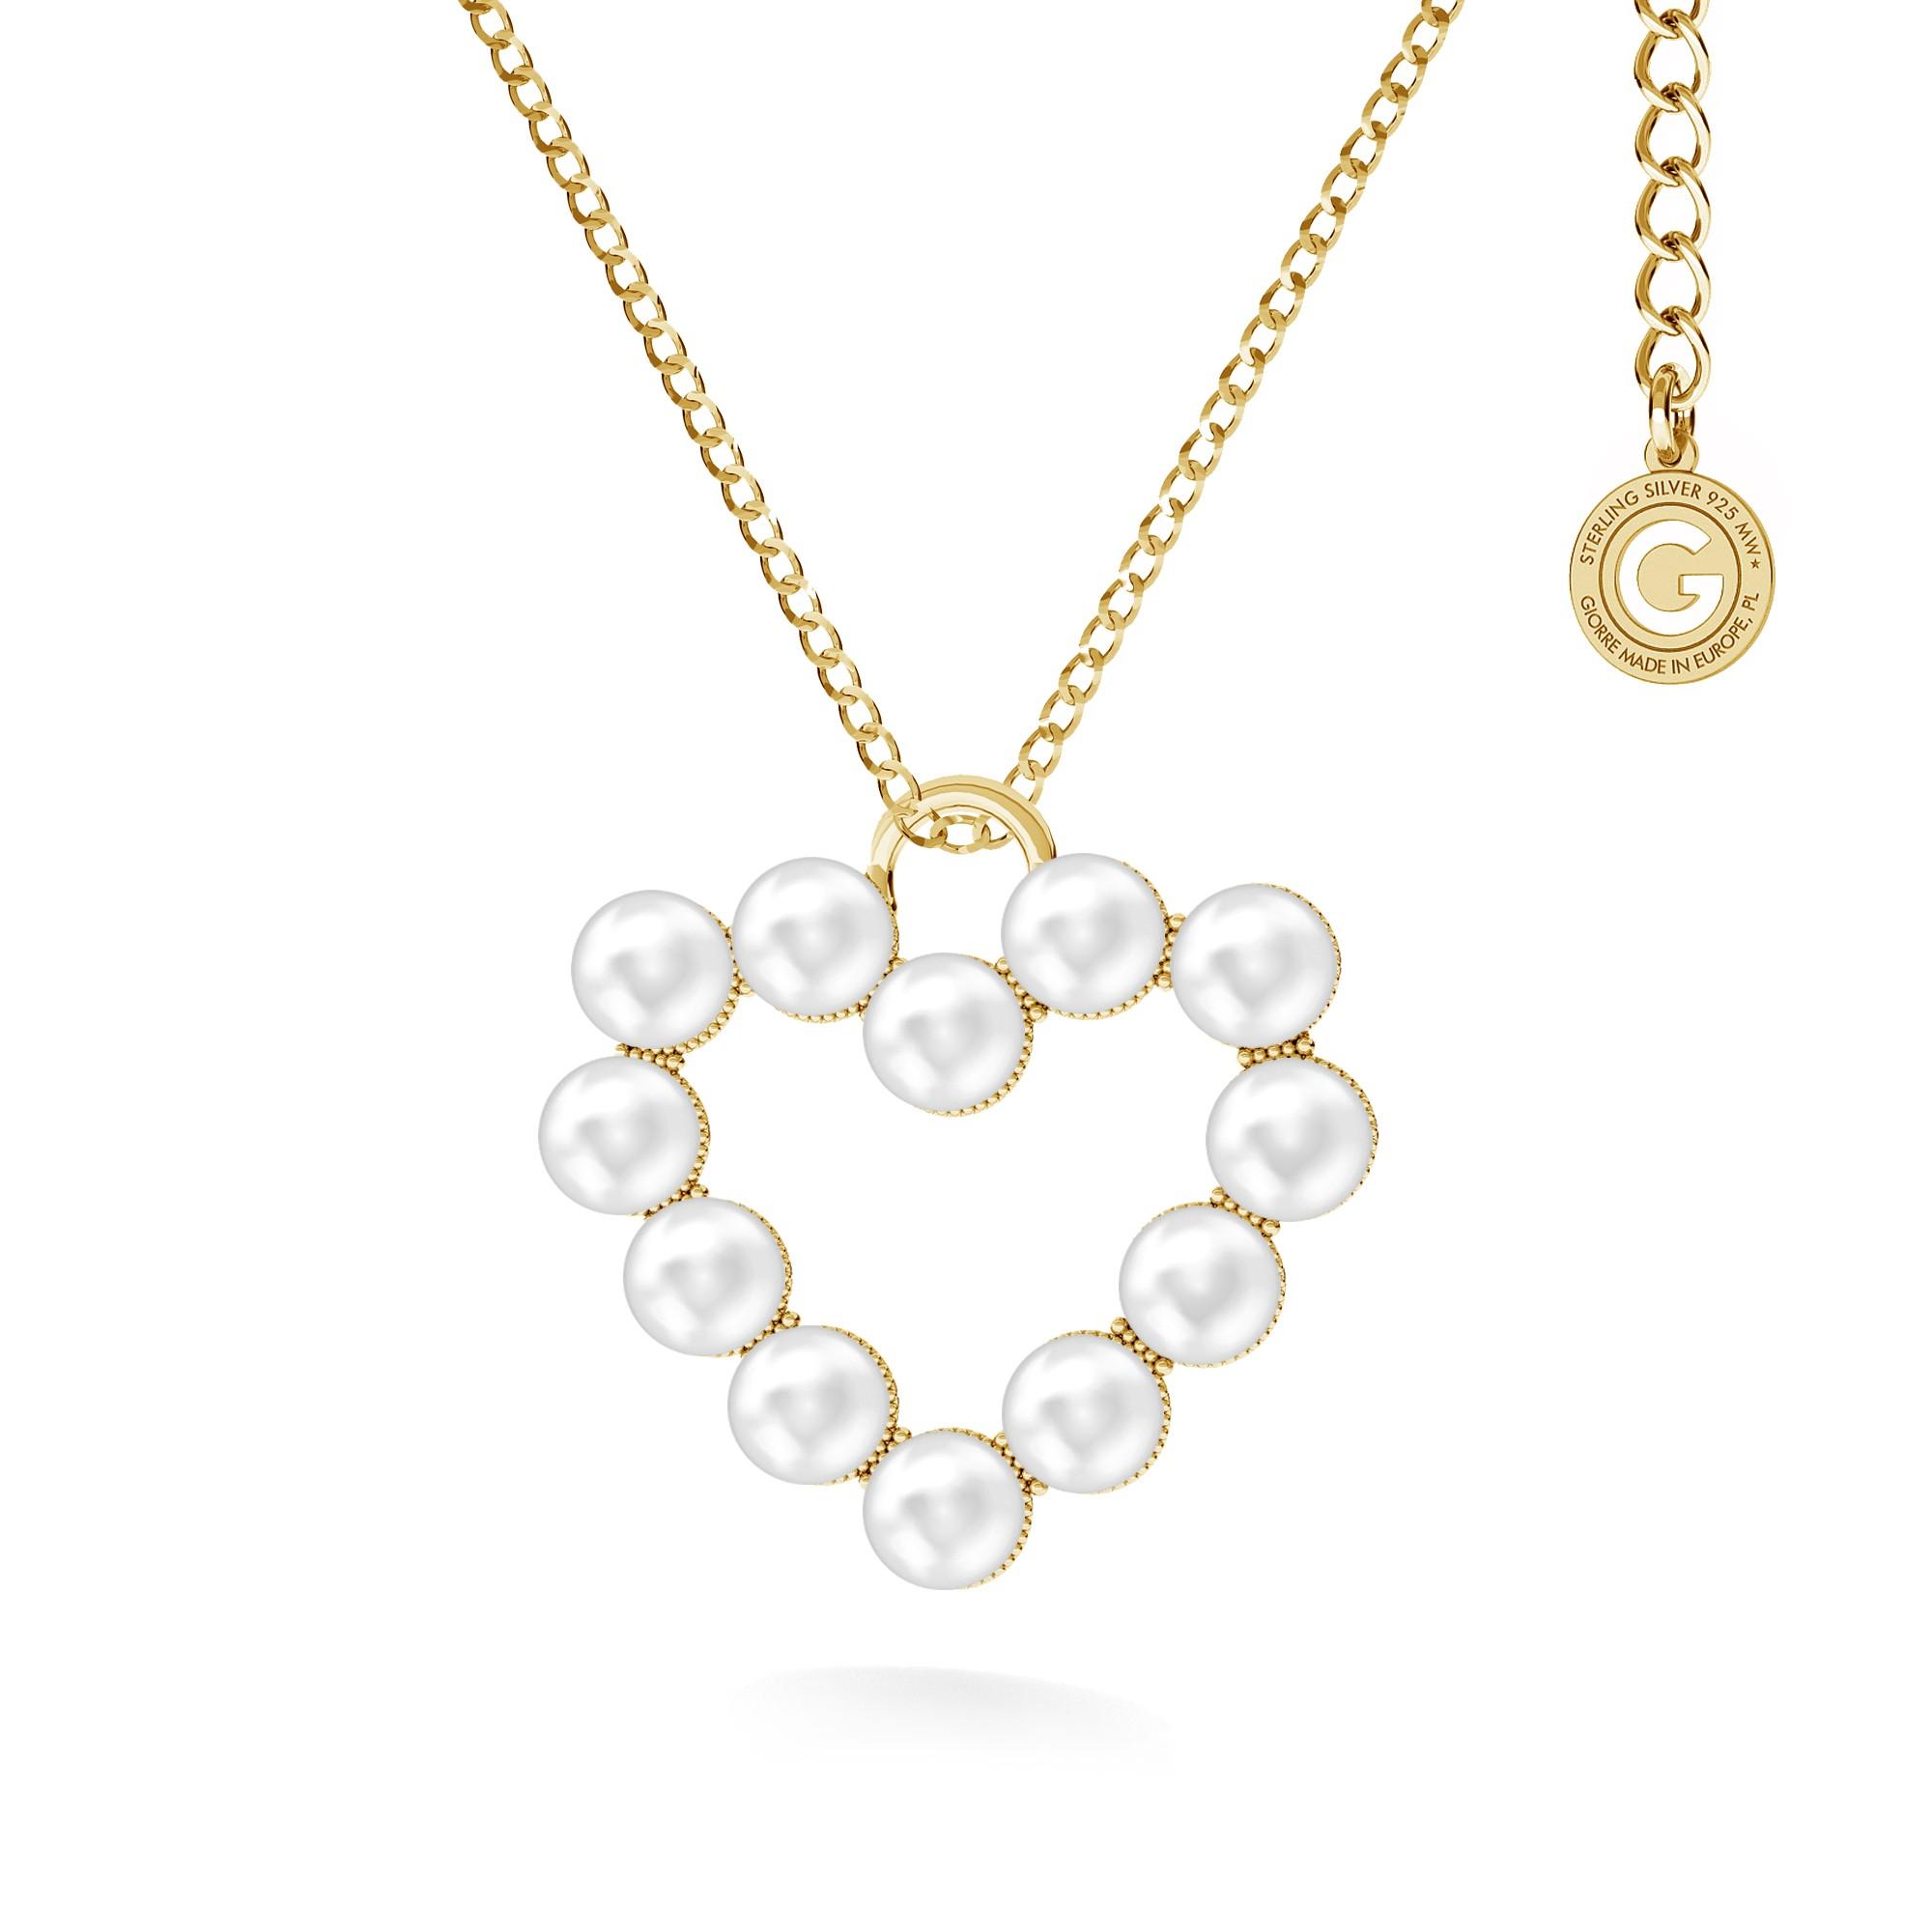 Heart necklace with swarovski pearls, silver 925 & Swarovski